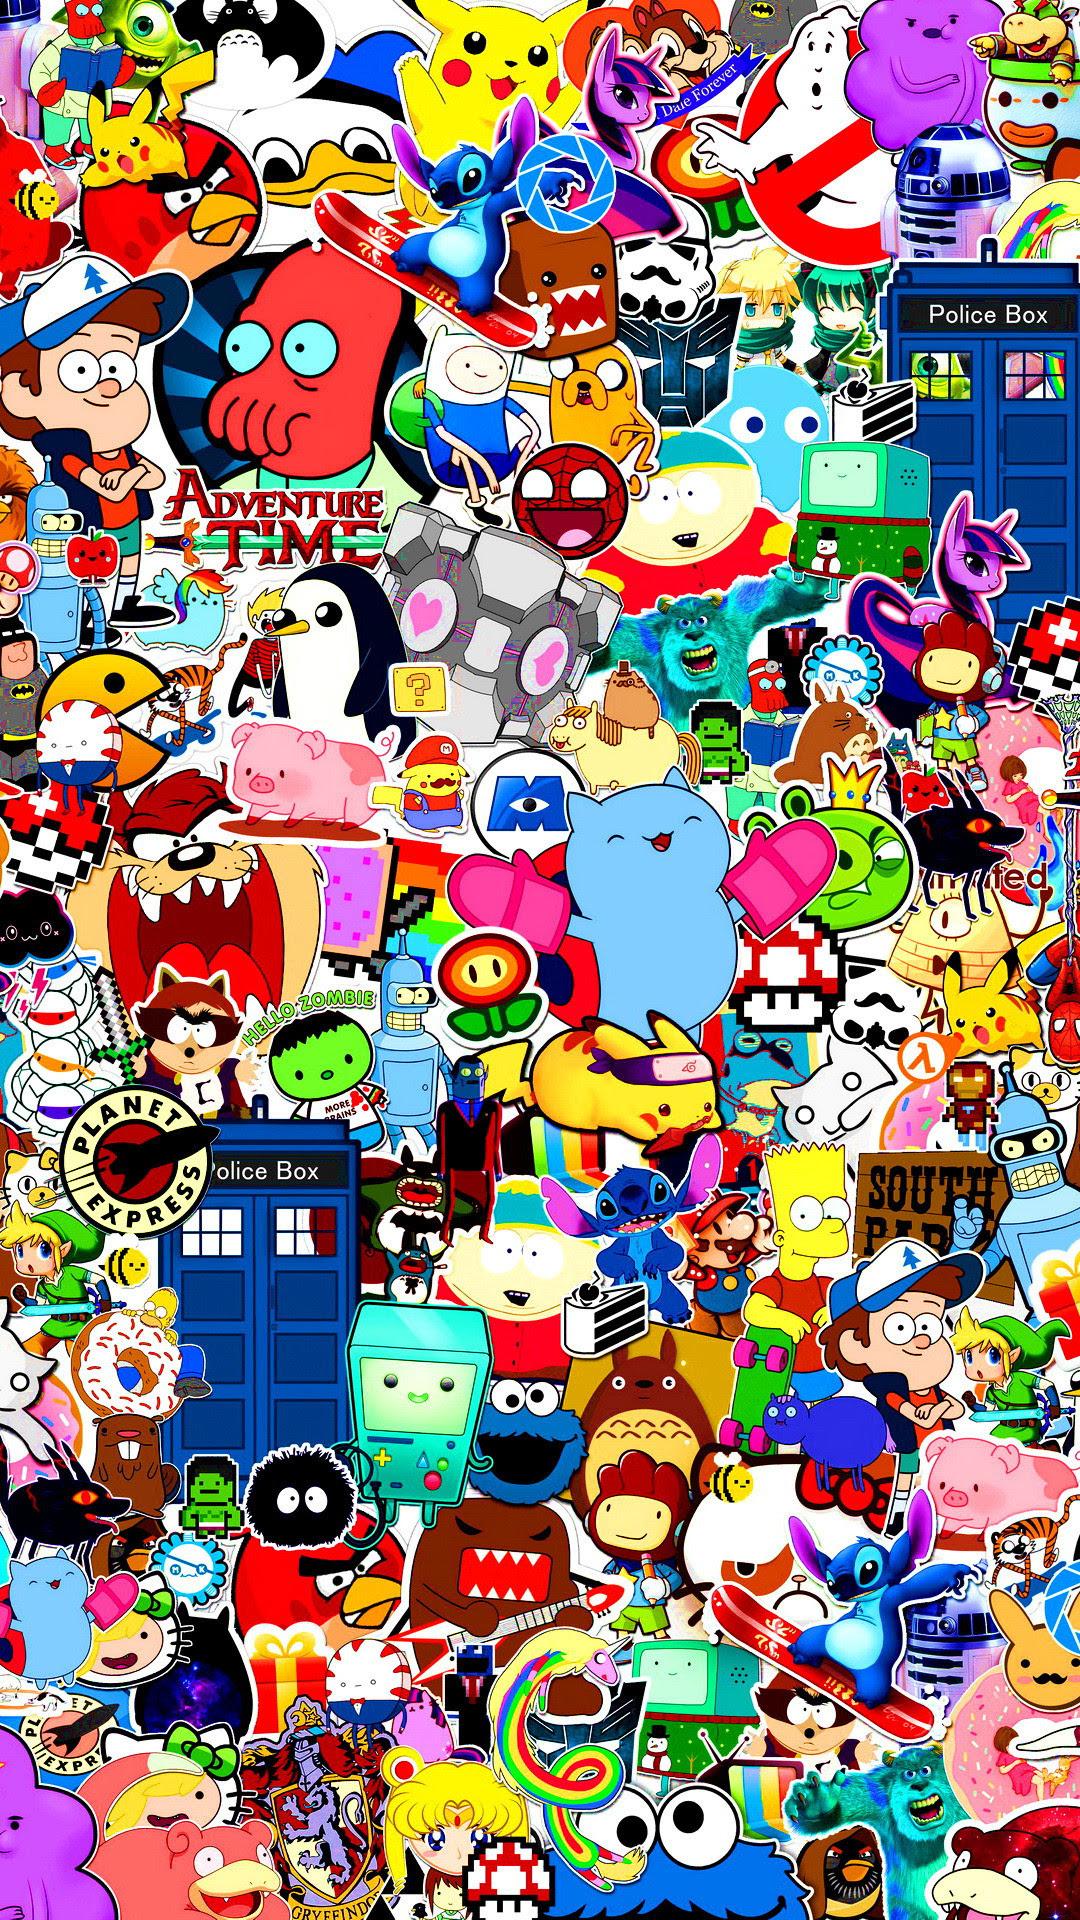 Colorful Doodle Wallpaper Hd